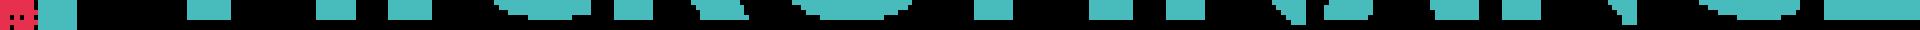 Vijfde editie Europese Microfinanciering Week